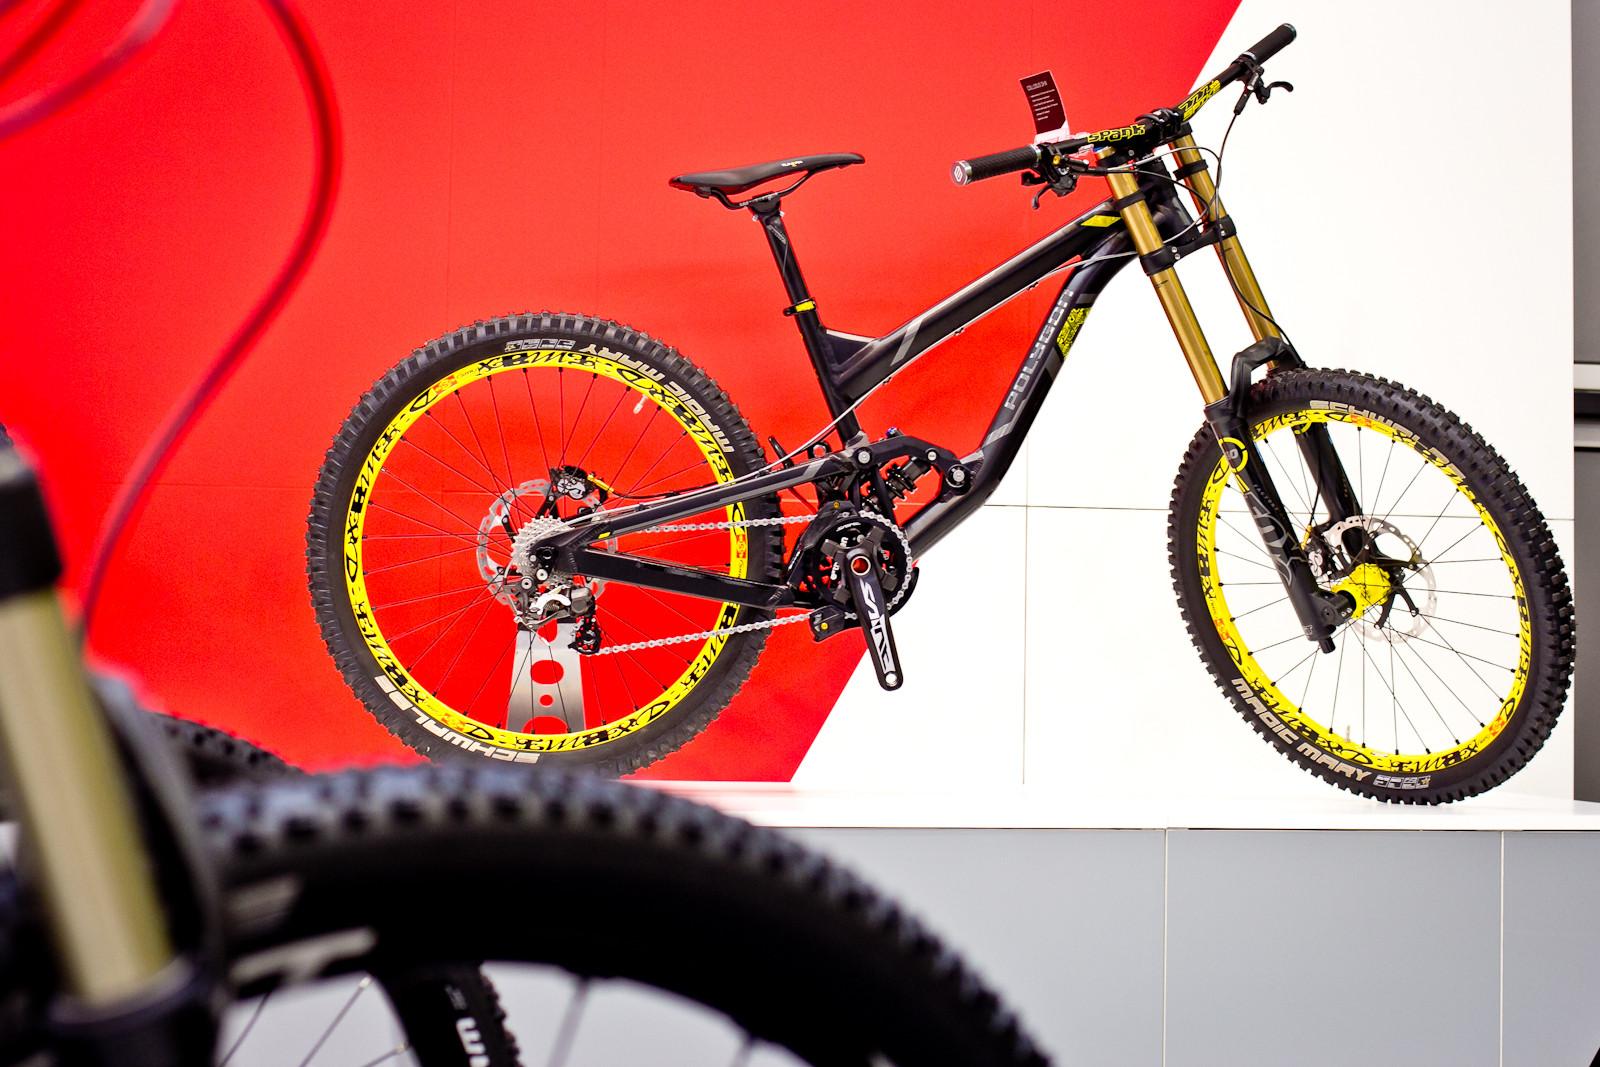 2015 Polygon Collosus DHX - 2015 Downhill Bikes at Eurobike 2014 - Mountain Biking Pictures - Vital MTB